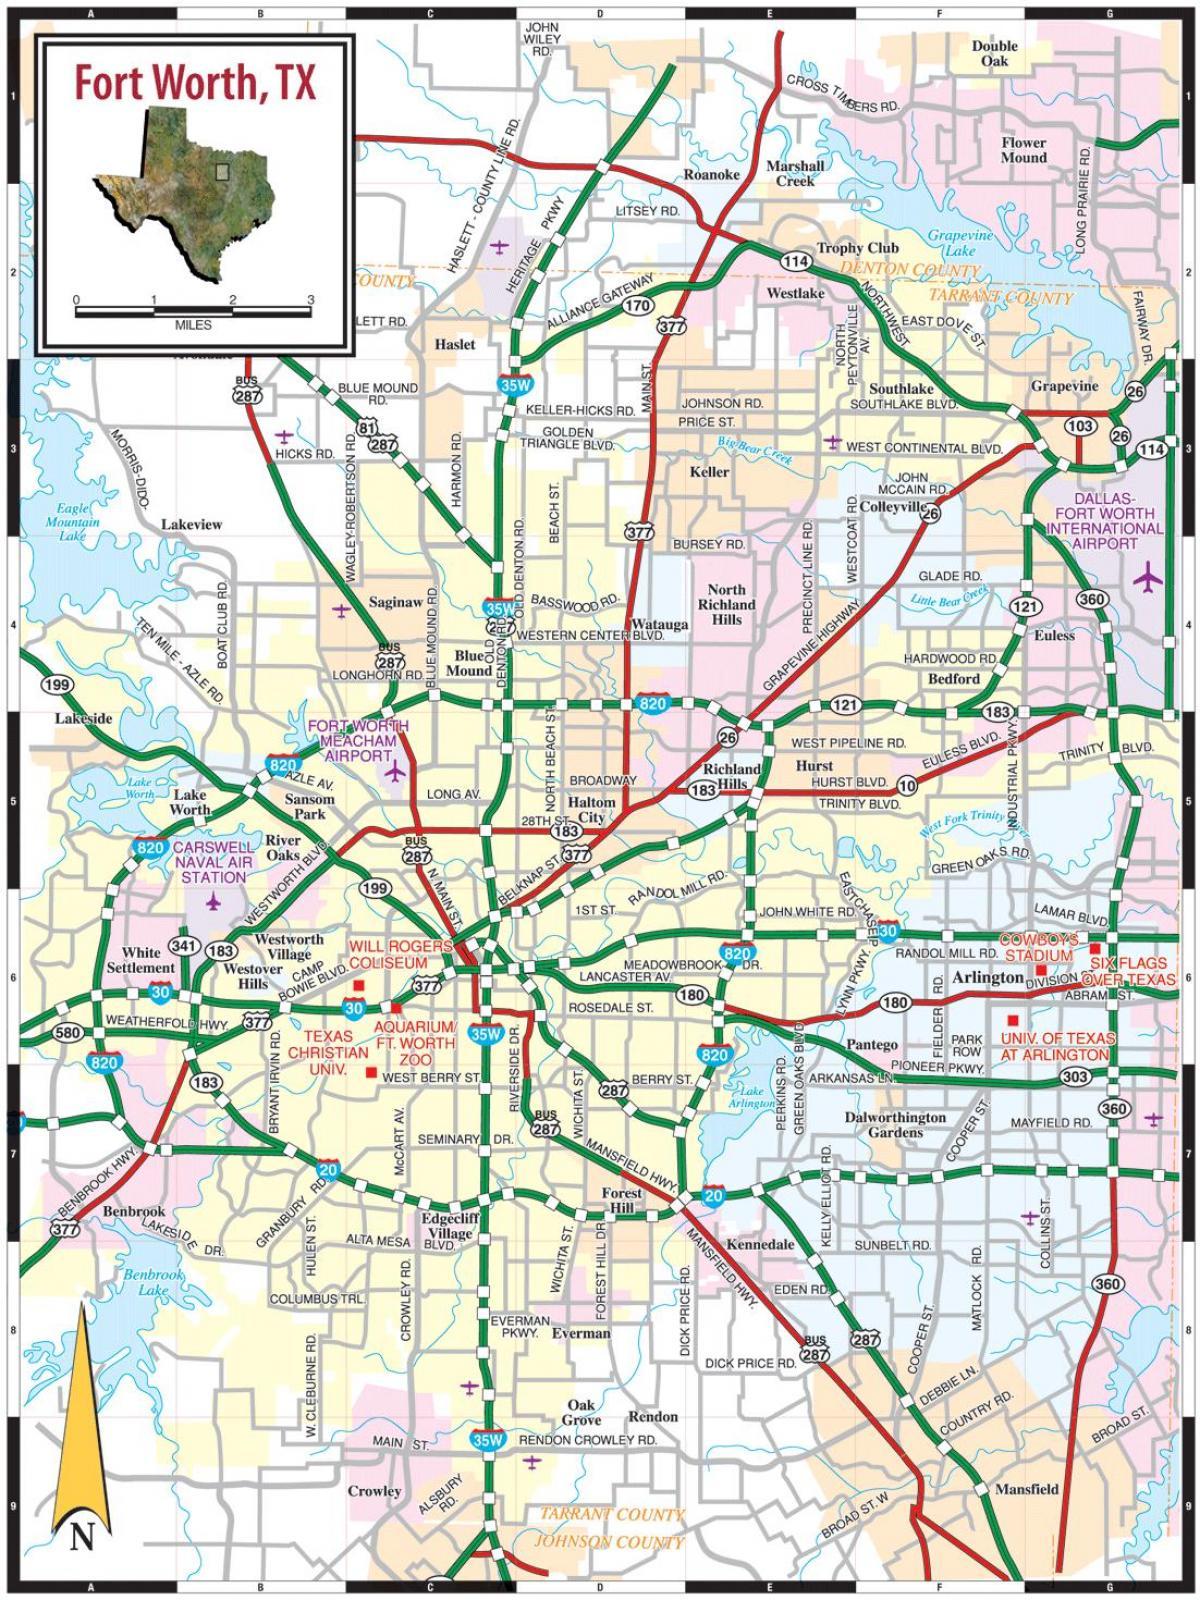 Fort Worth Street Map - Street Map Fort Worth Texas (Texas - Usa) - Street Map Of Fort Worth Texas